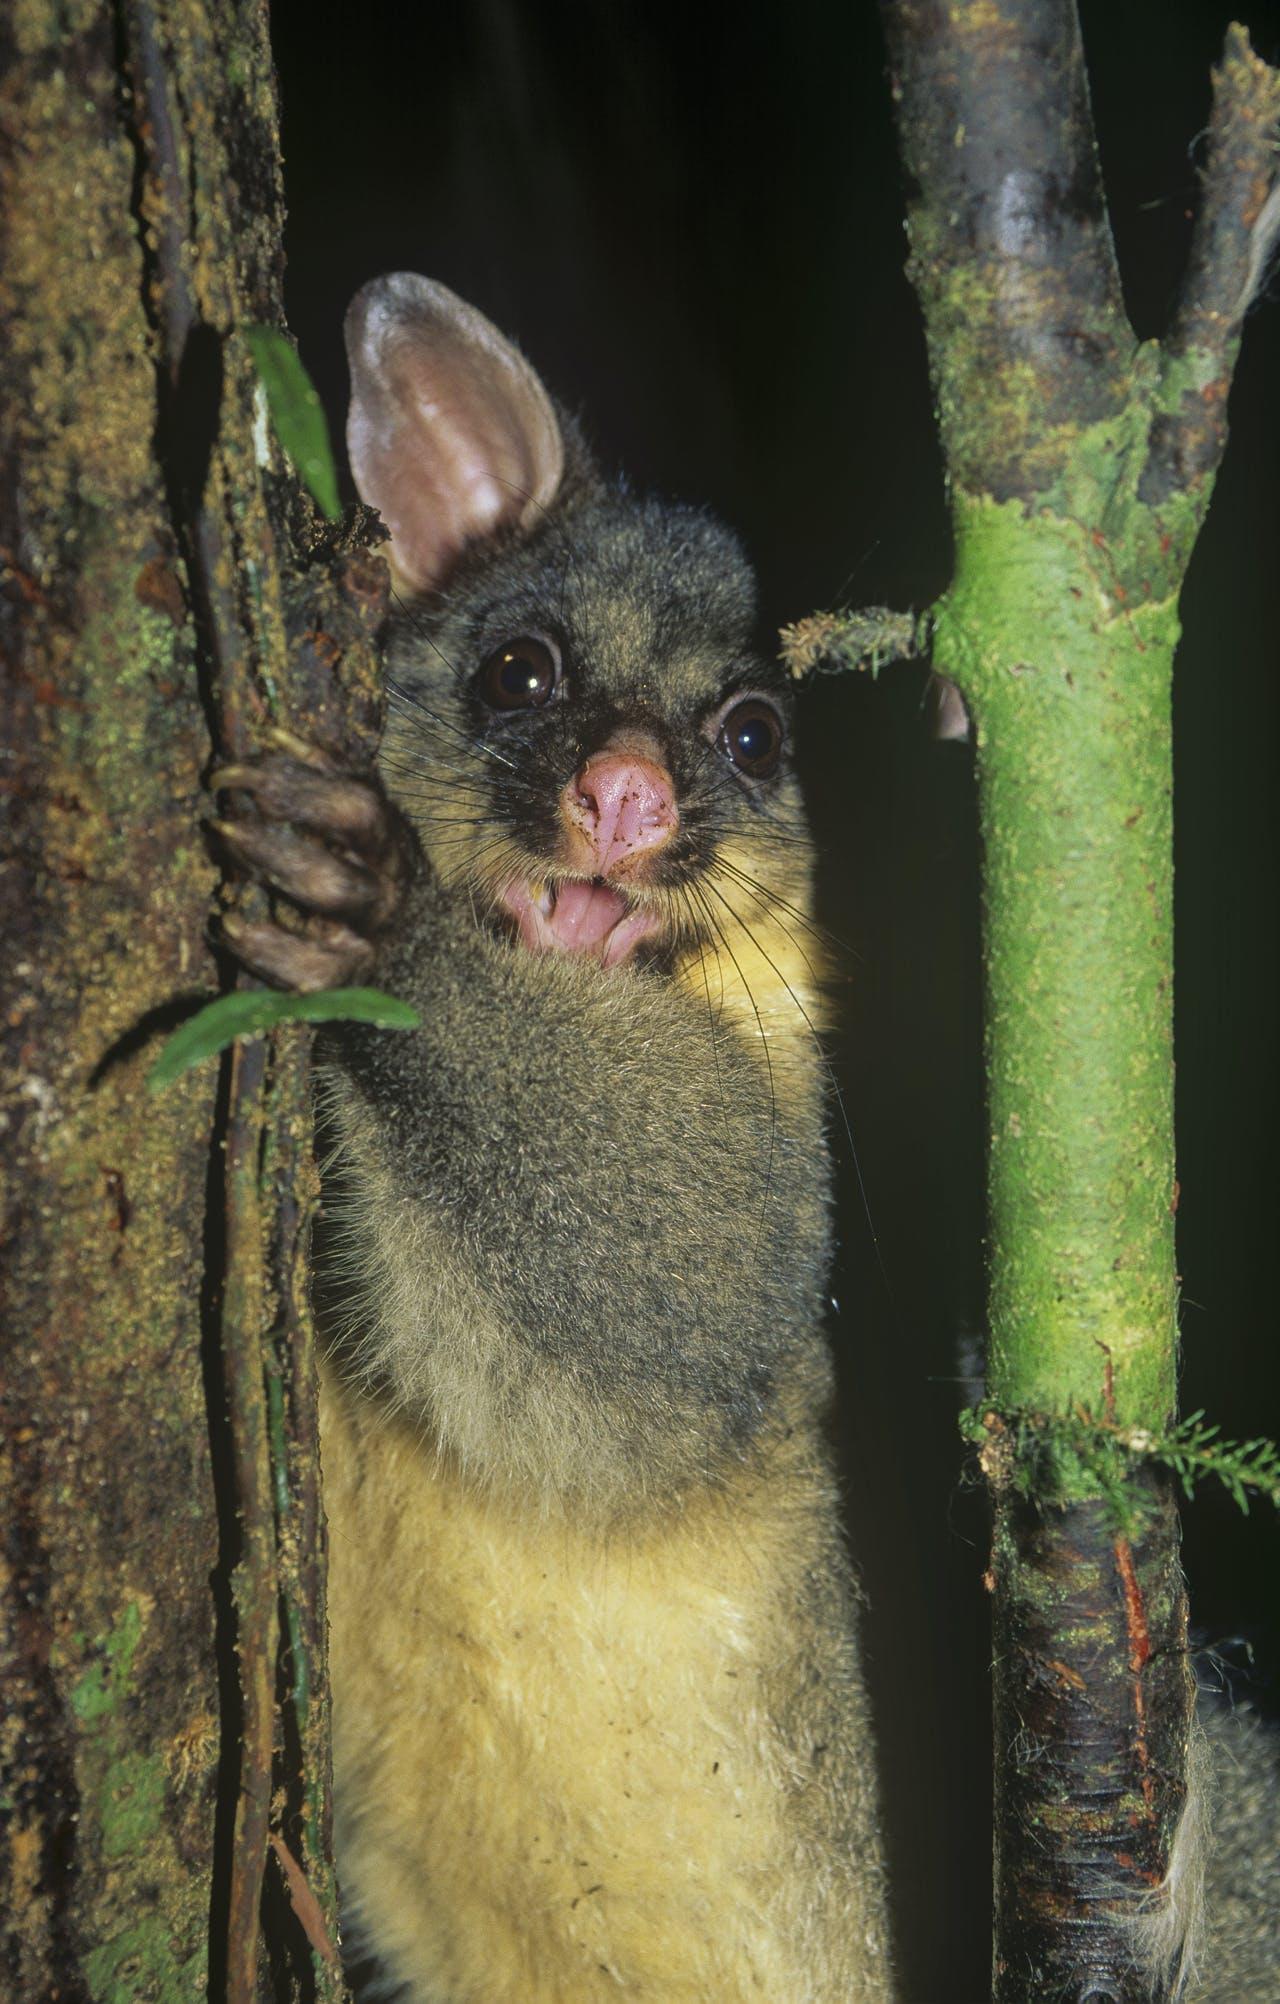 Possum, Moetoa Forest, King Country. Photo: Shaun Barnett